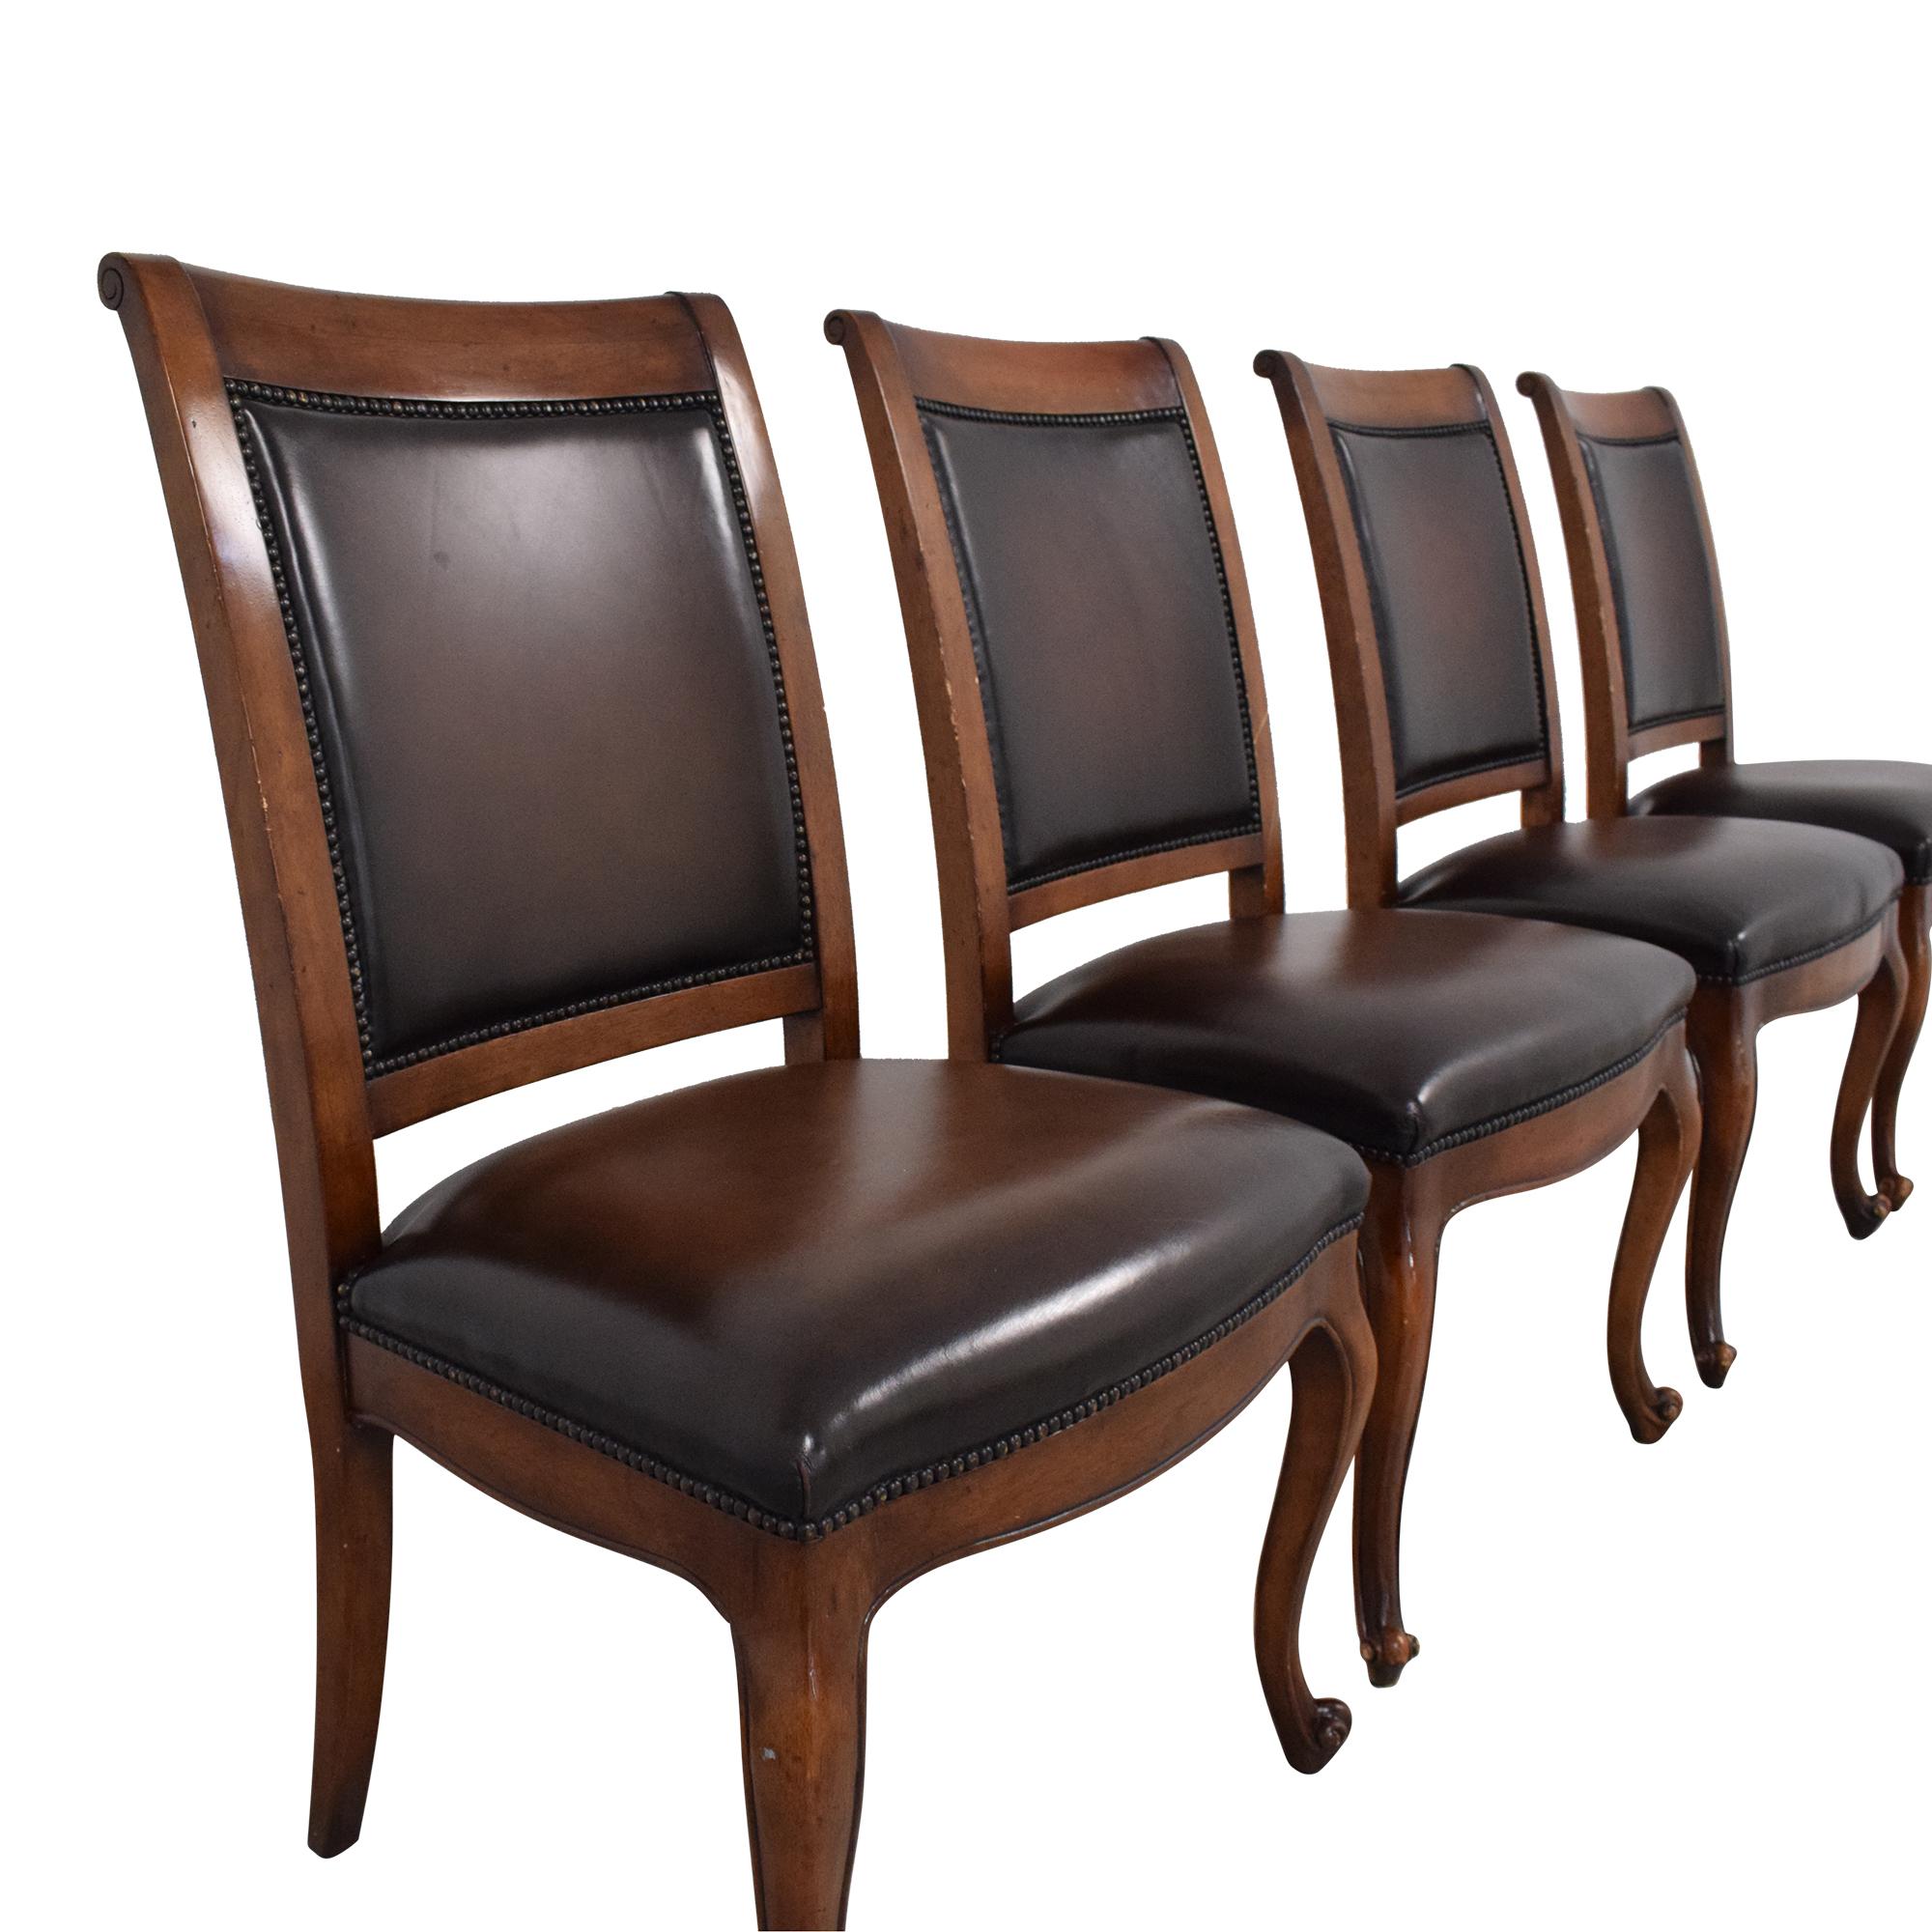 Theodore Alexander Theodore Alexander Dining Chairs nj